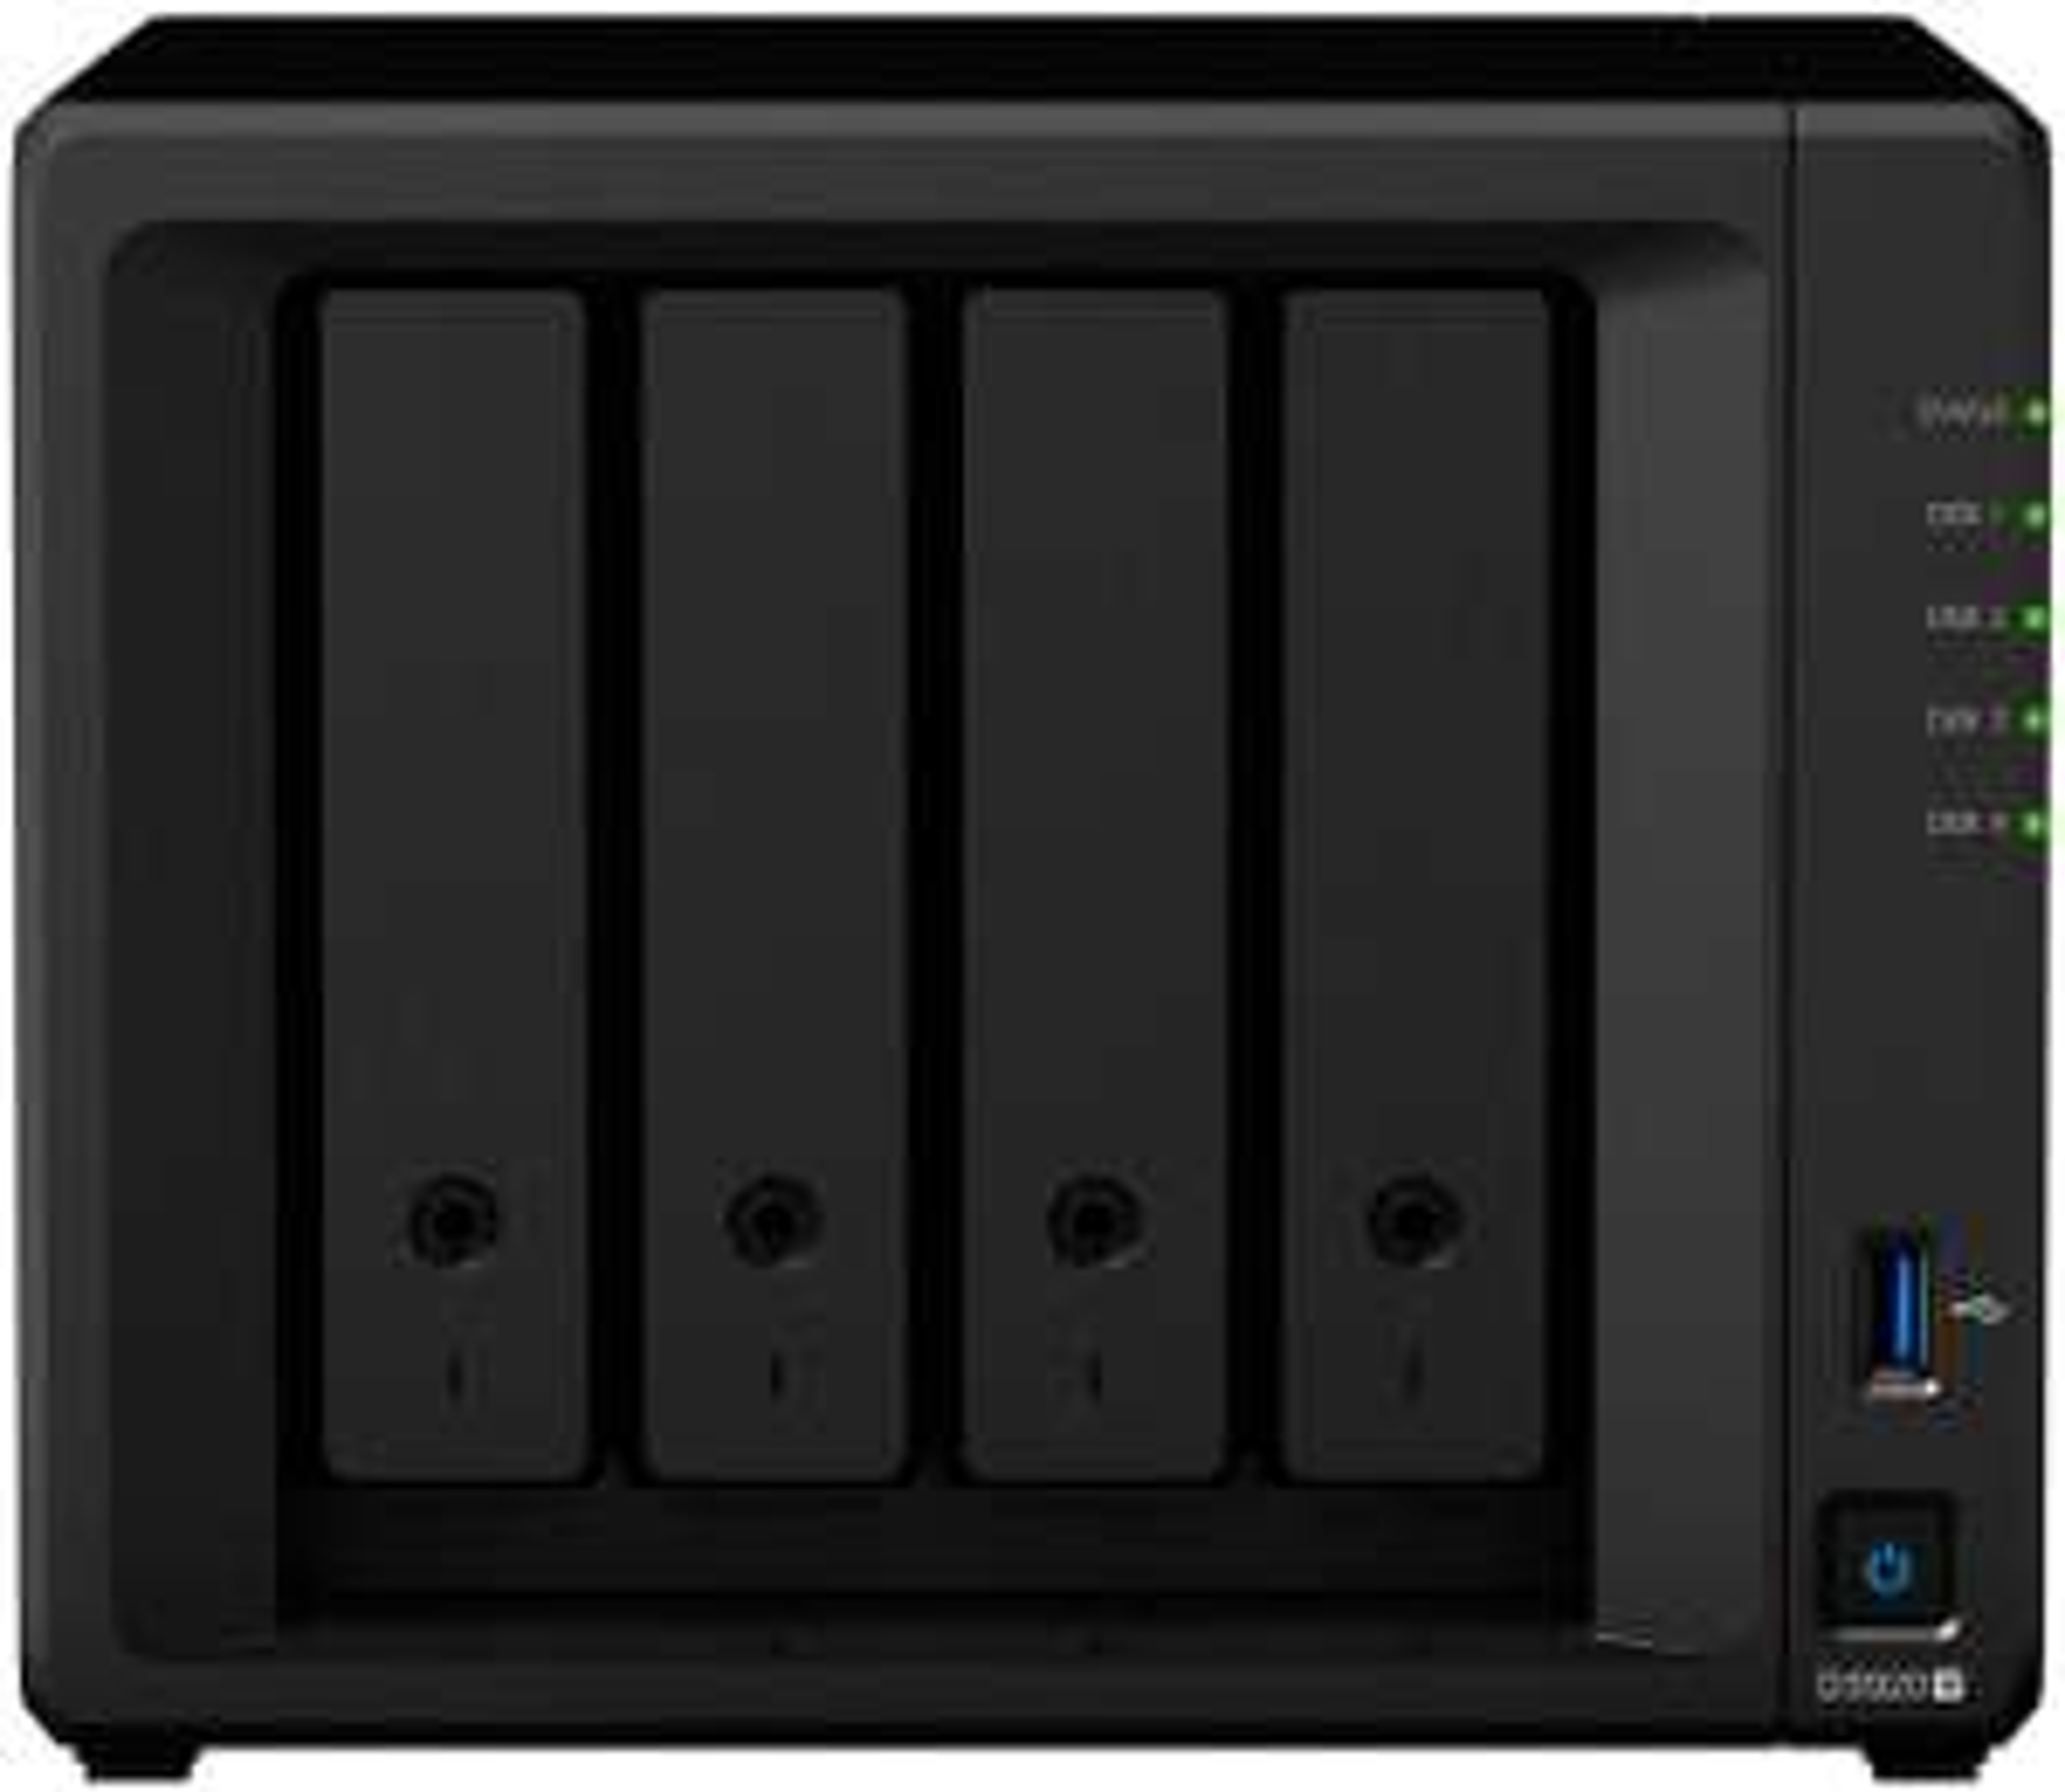 Serveur NAS Synology DiskStation DS920+, 4 baies, 4 Go RAM, Noir (Frontalier Suisse)